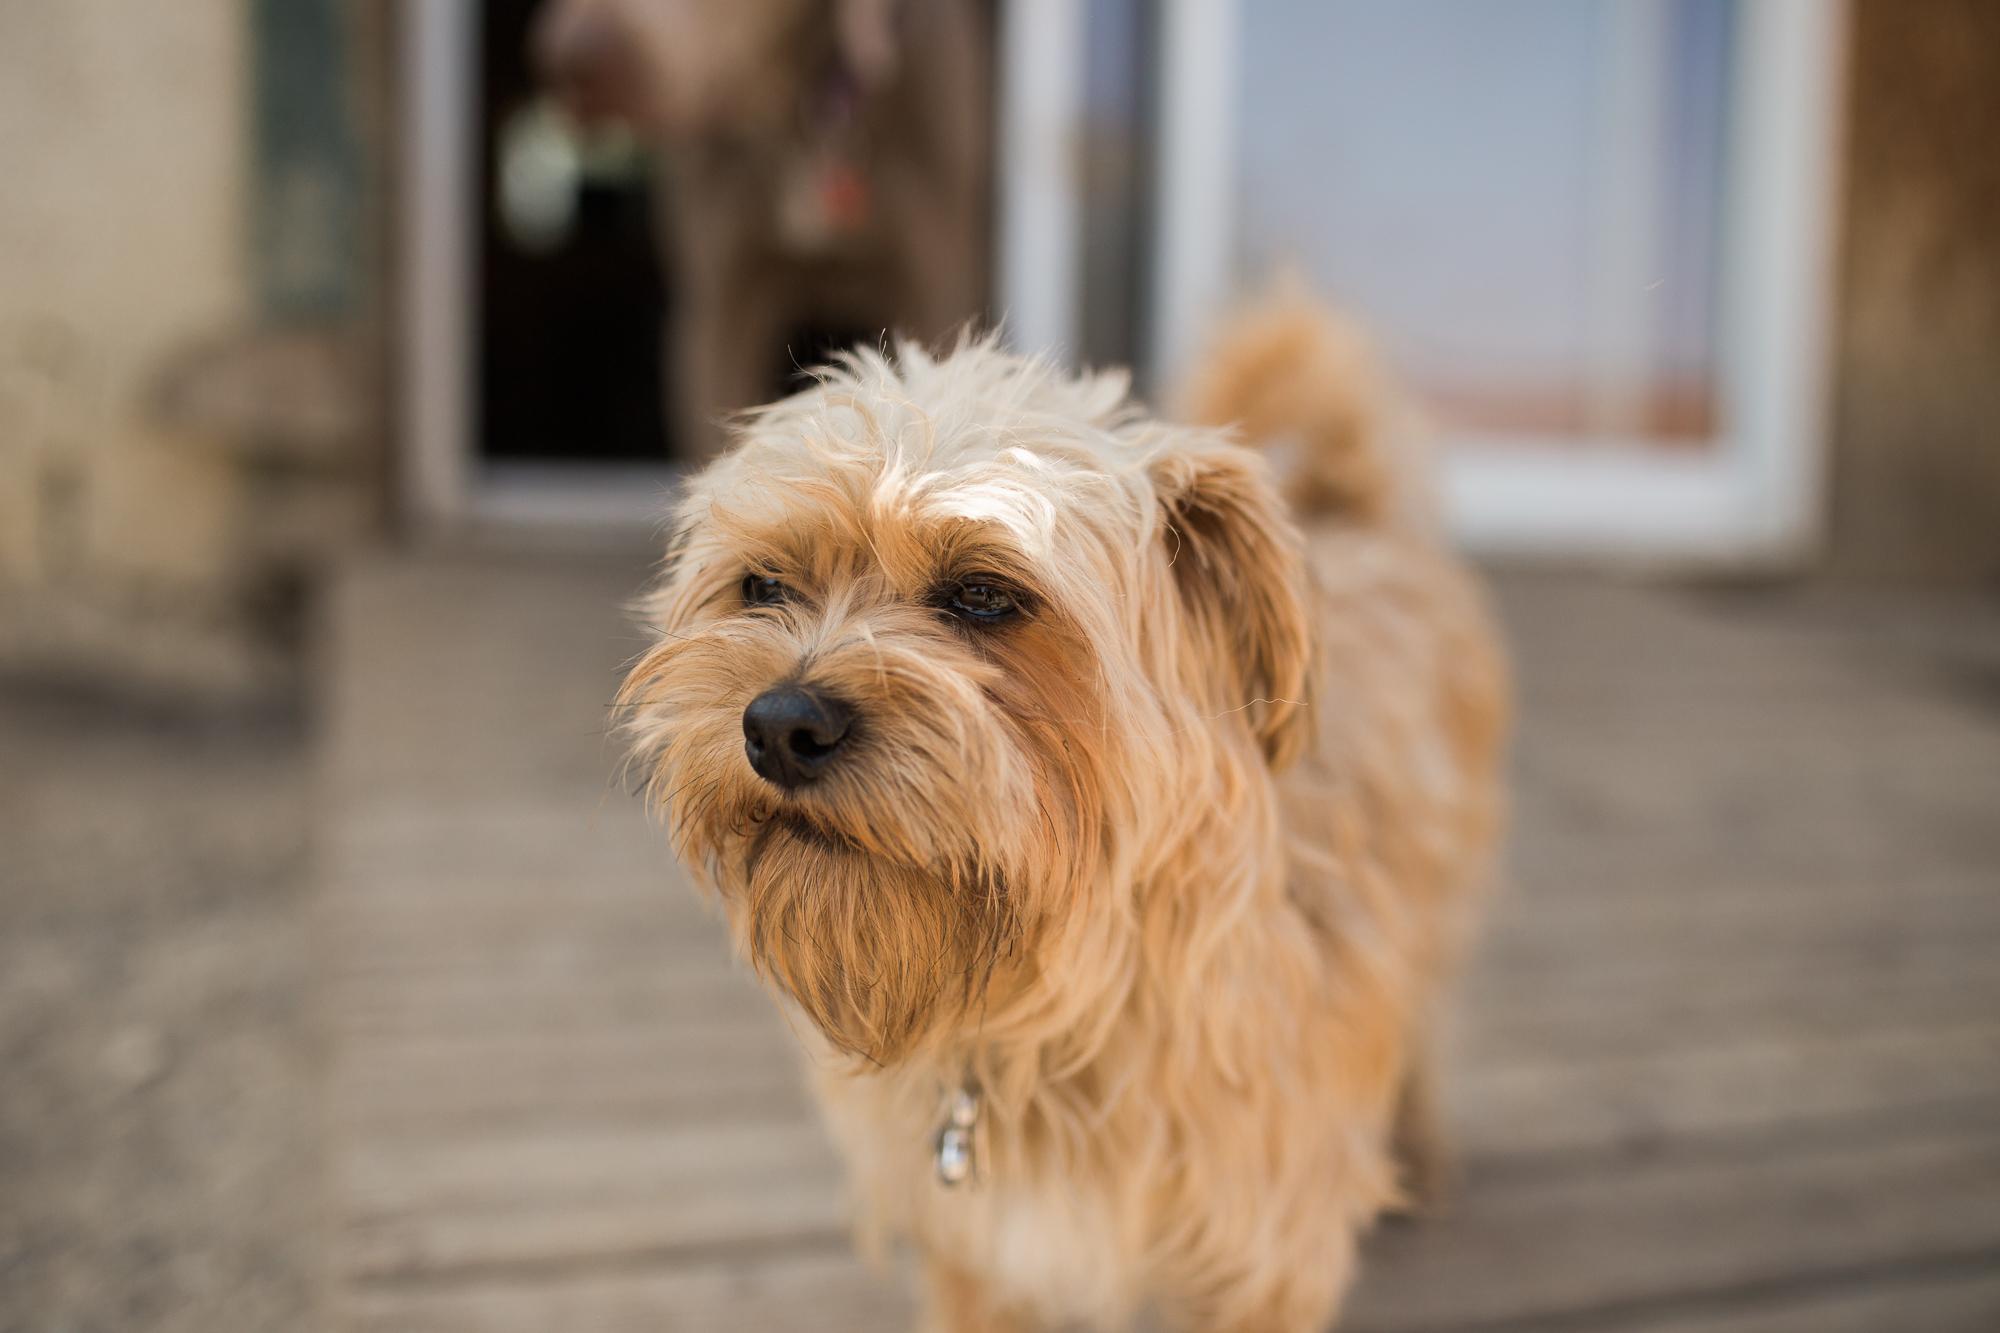 Barking-Good-Dogs-48.jpg